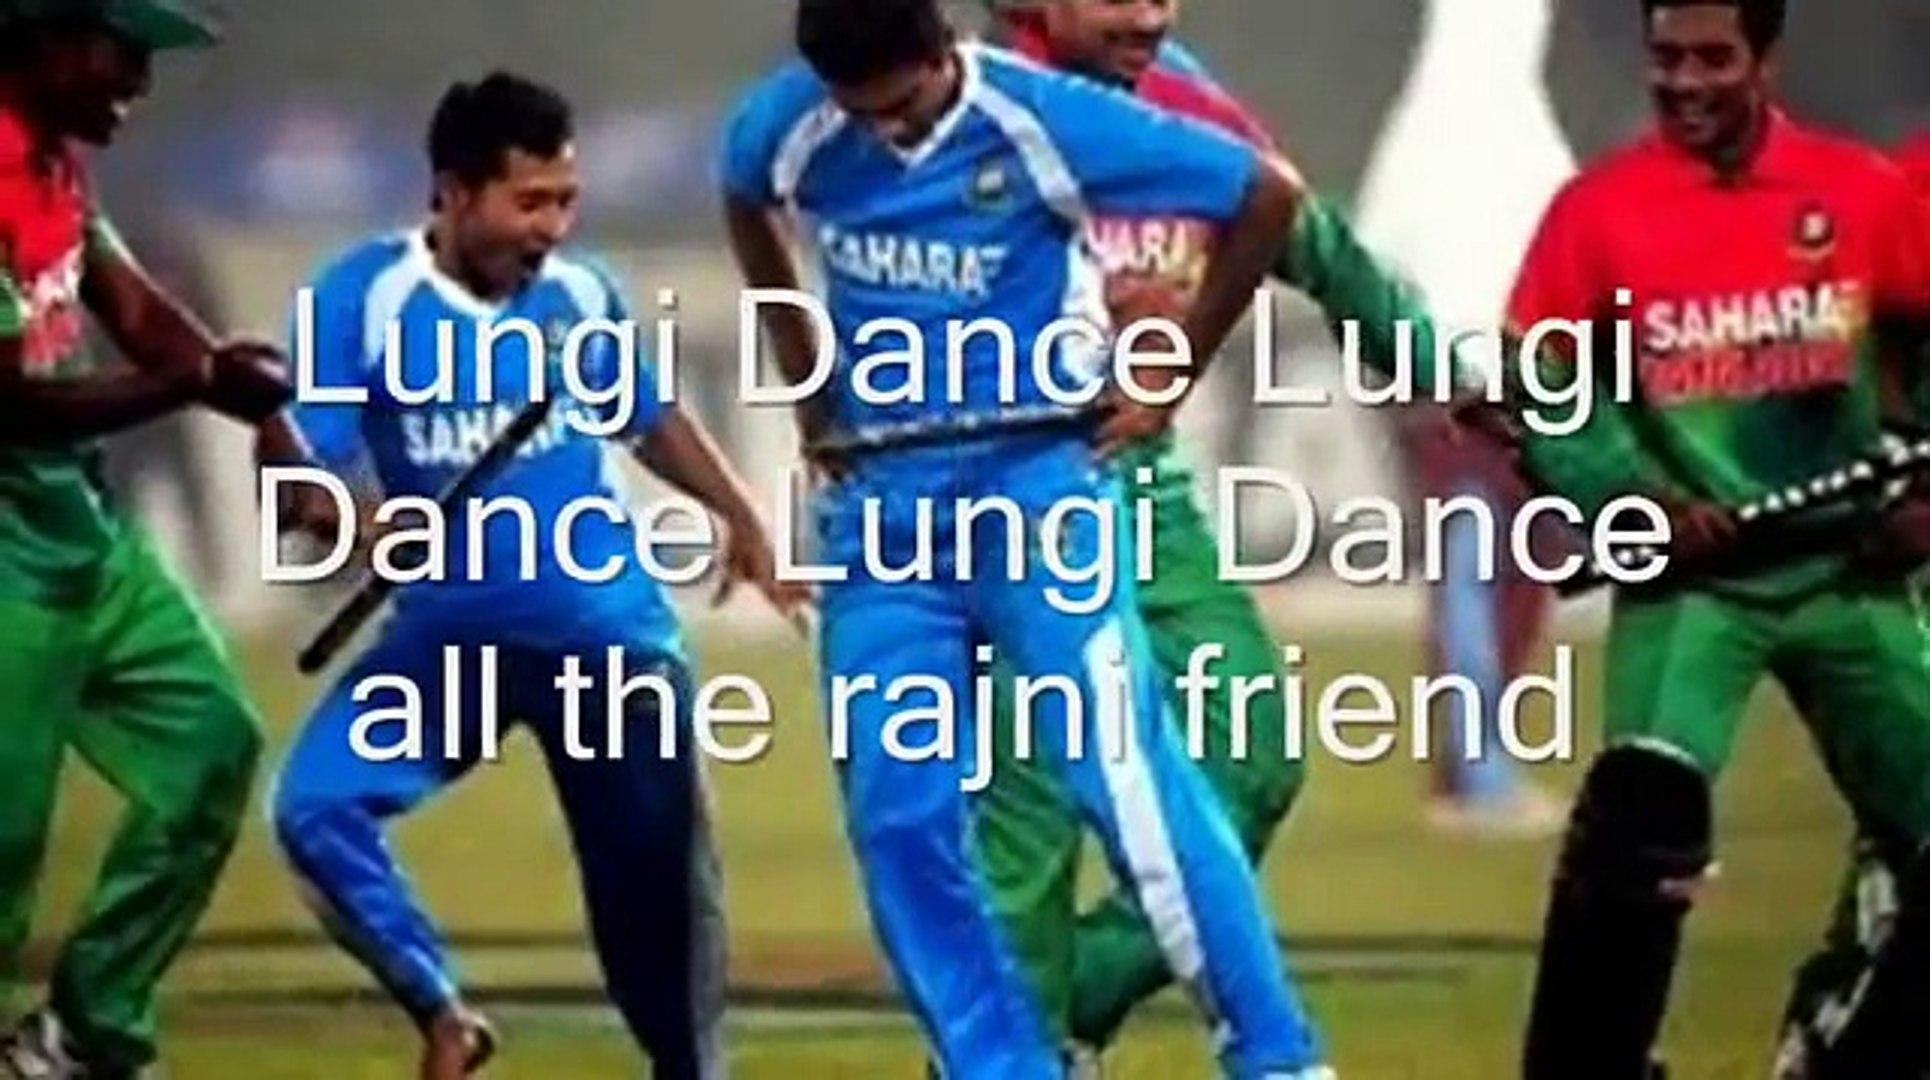 VERY FUNNY CRICKET! T20 cricket funny moments - 50-50 cricket funny videos clips